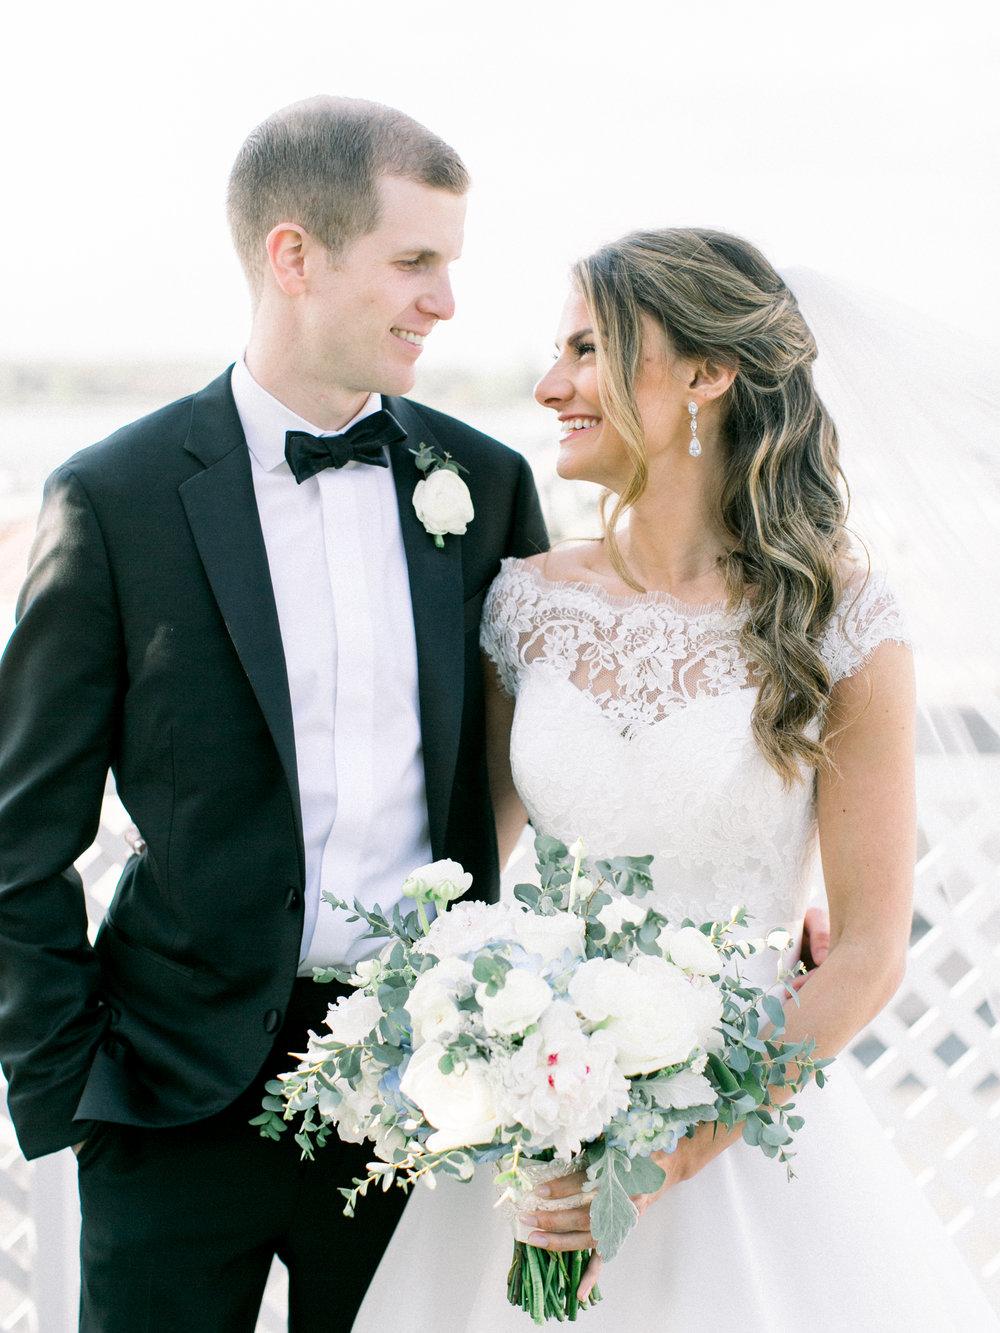 brianne&david_5.12.18_wedding-378.JPG